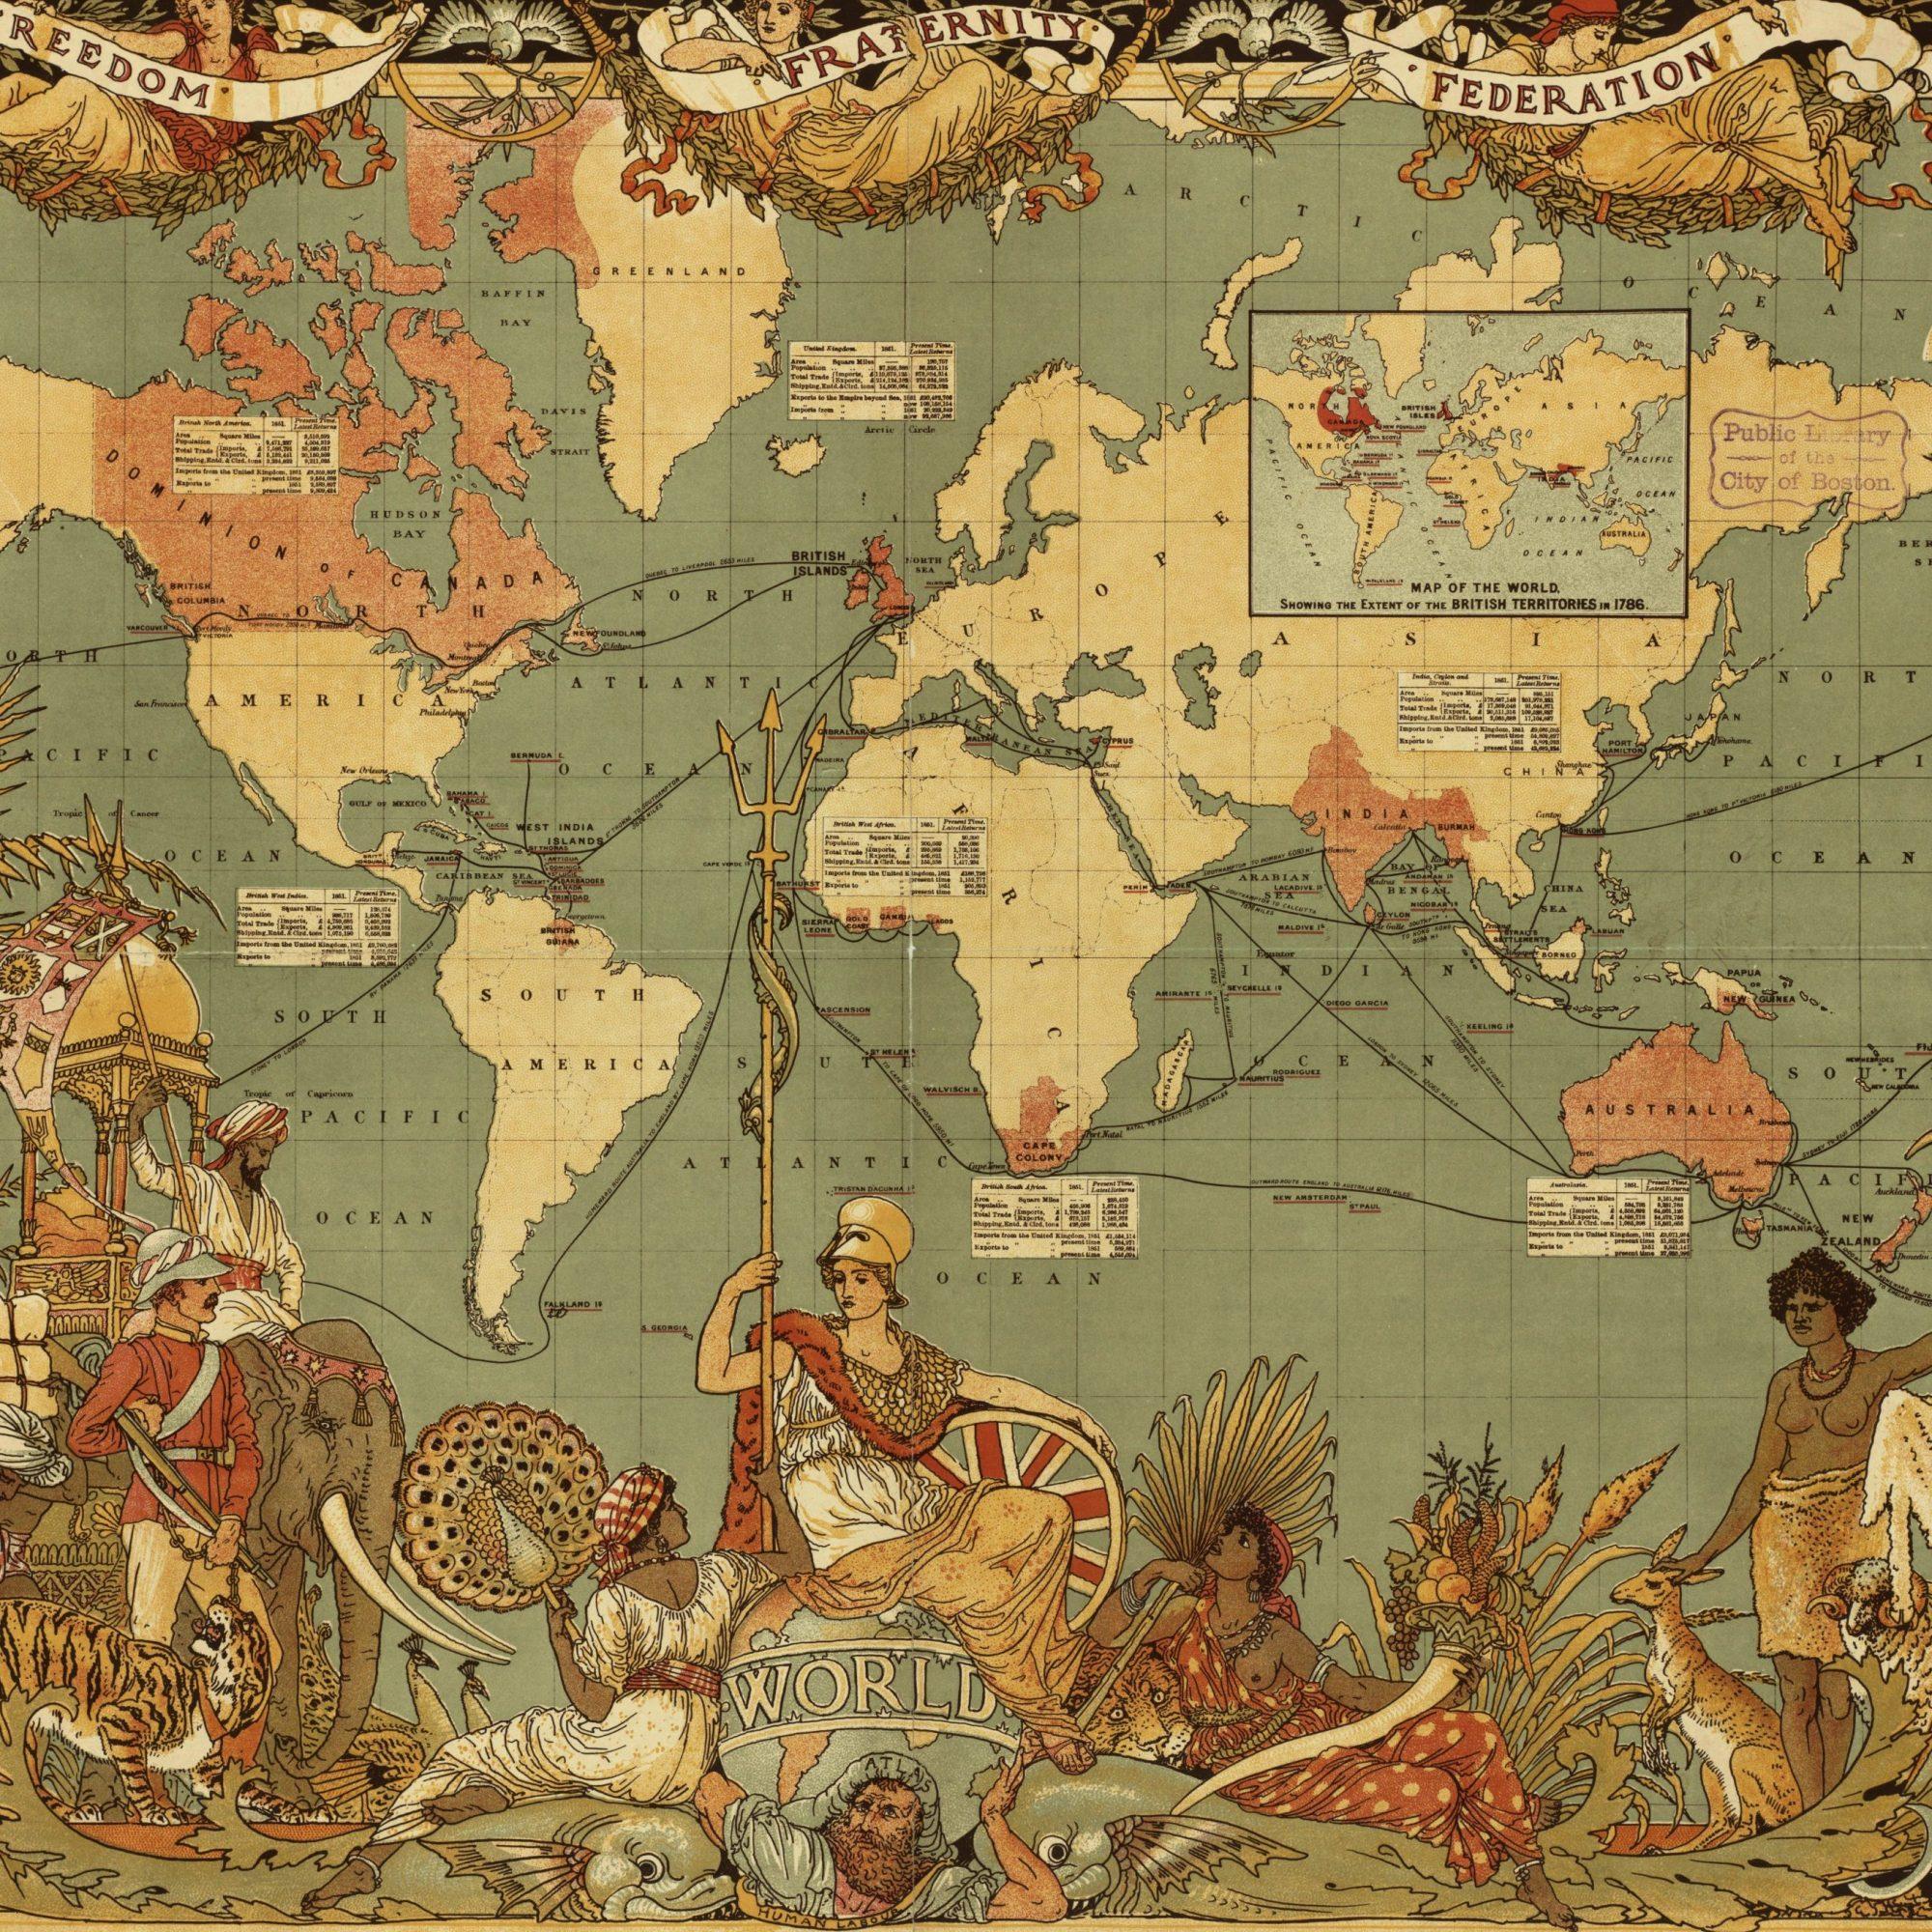 The Politics of World Maps – On Art and Aesthetics